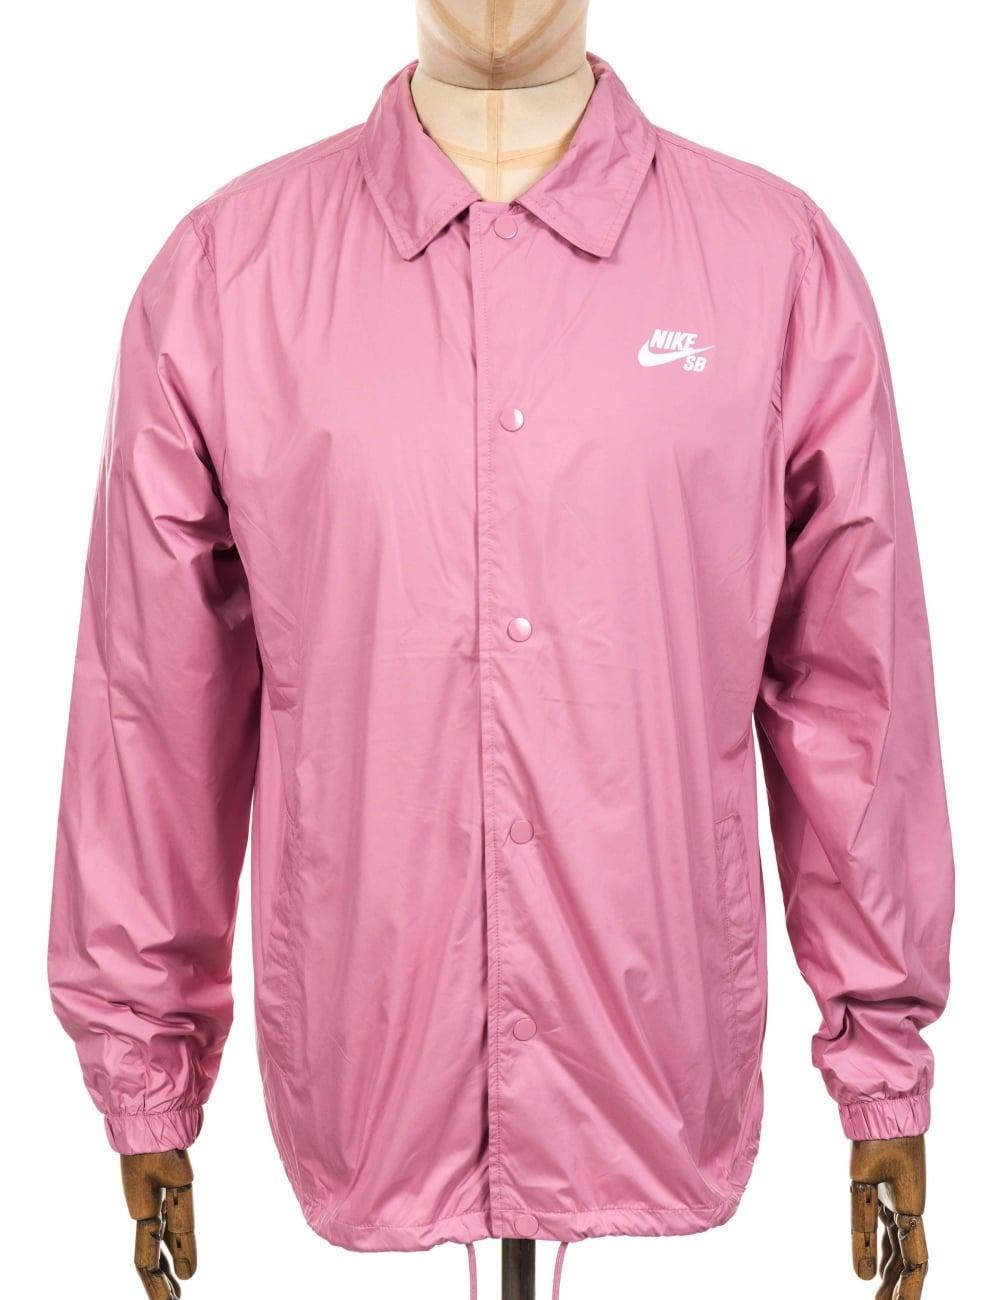 23617d22109b Nike SB Shield Coach Jacket - Pink - Clothing from Fat Buddha Store UK